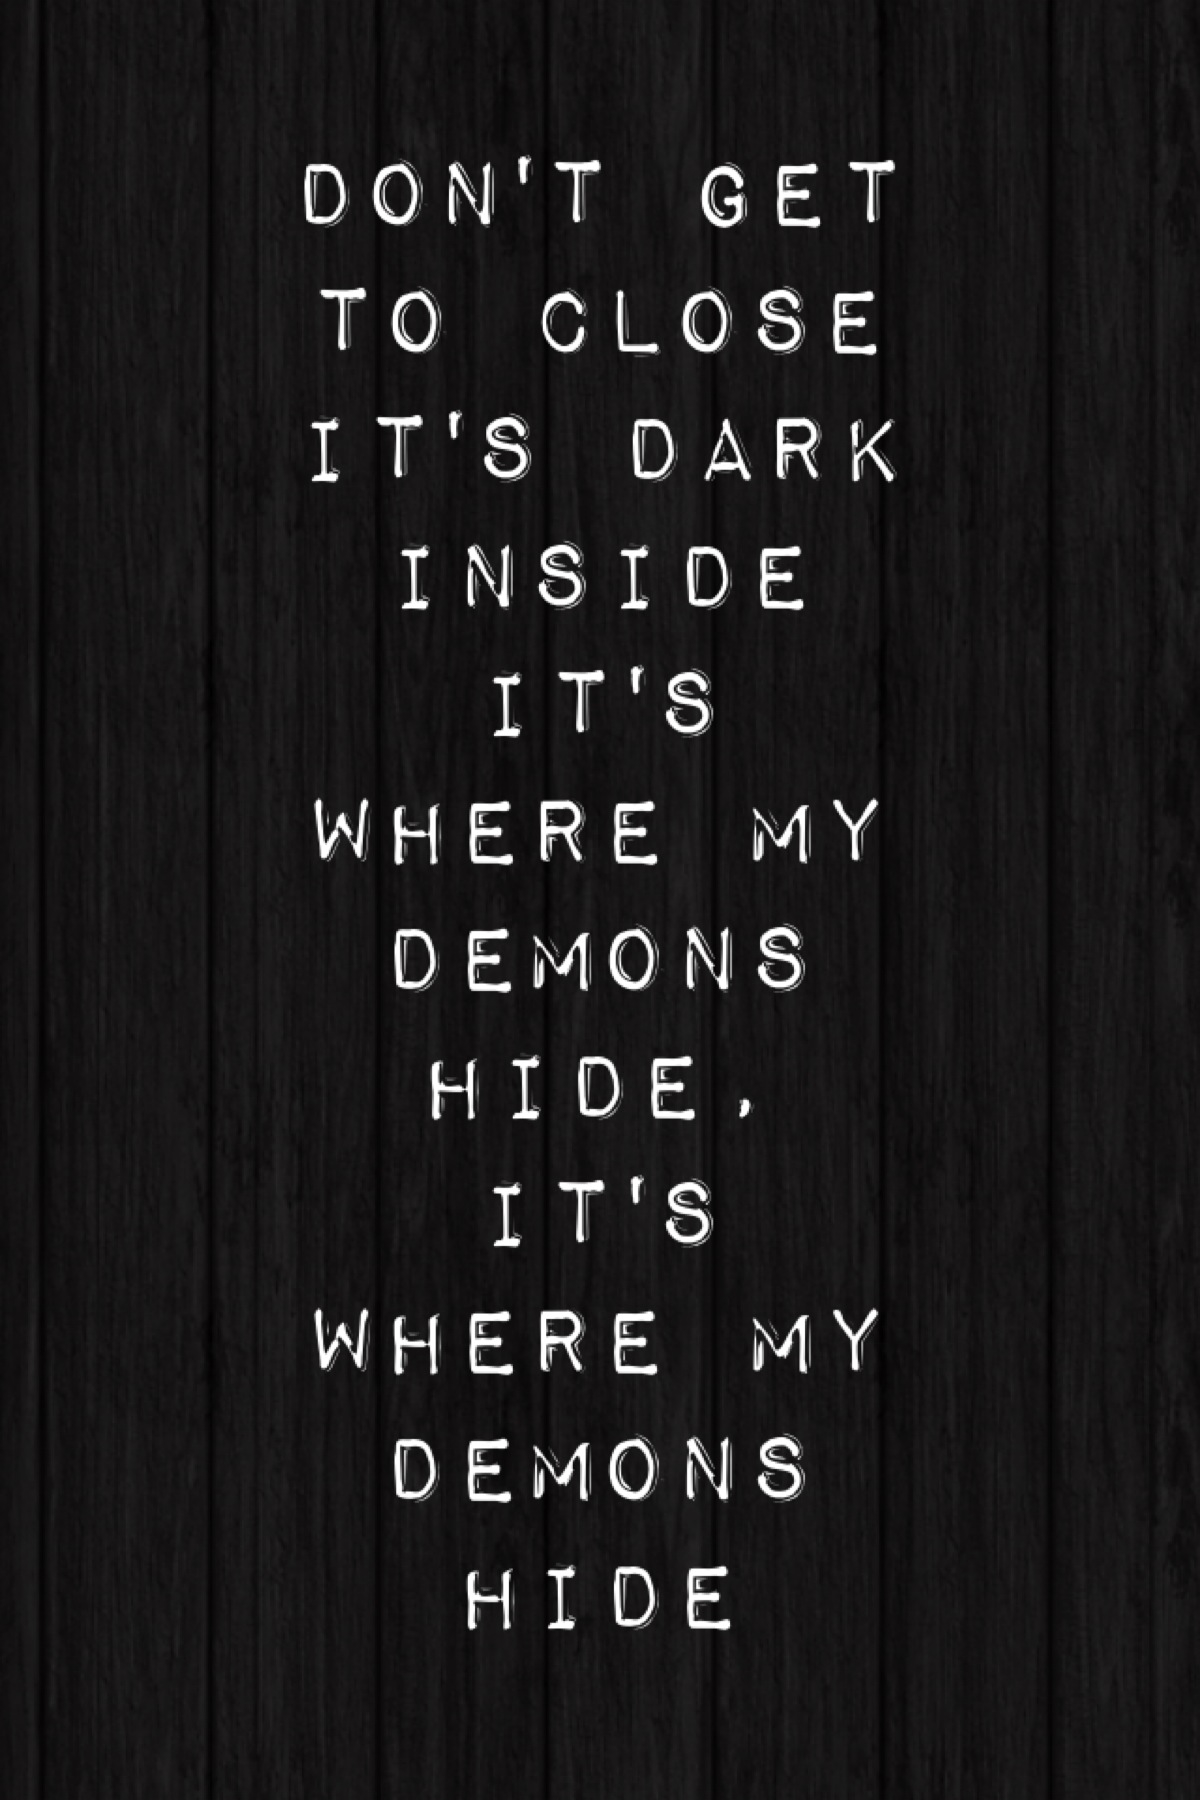 Demons Imagine Dragons Quotes. QuotesGram  Demons